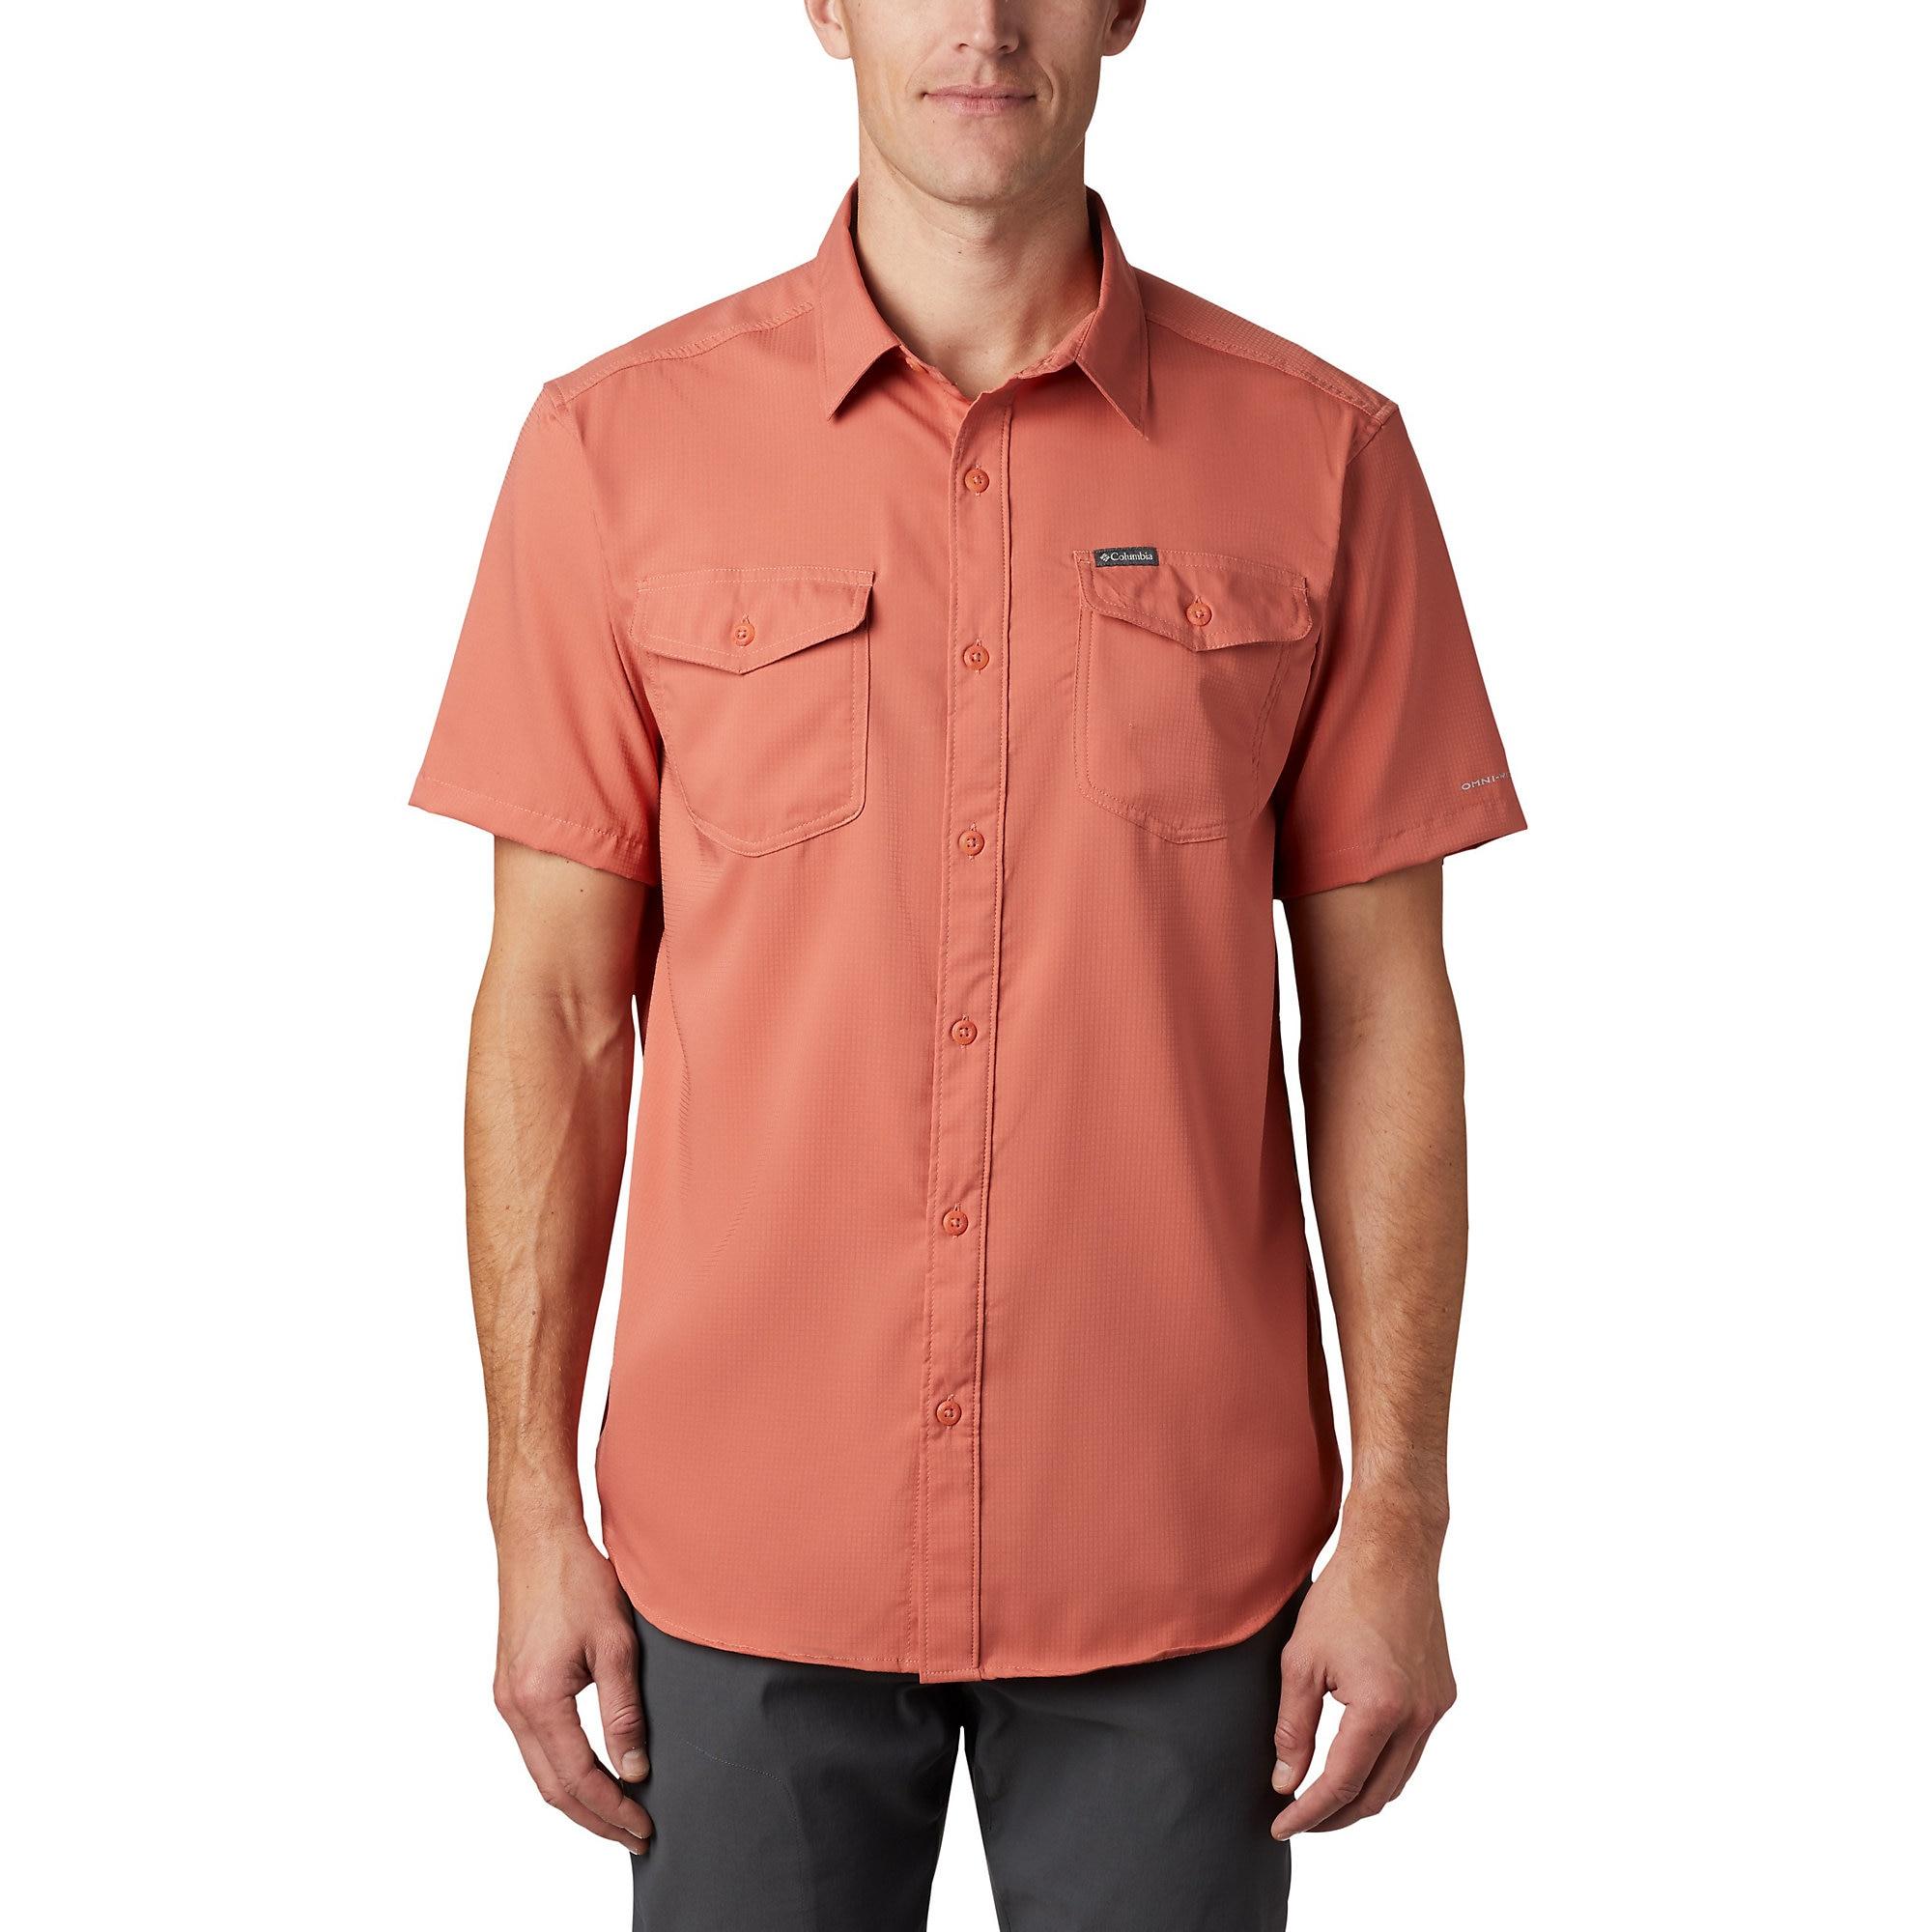 Columbia Utilizer II Short Sleeve Shirt